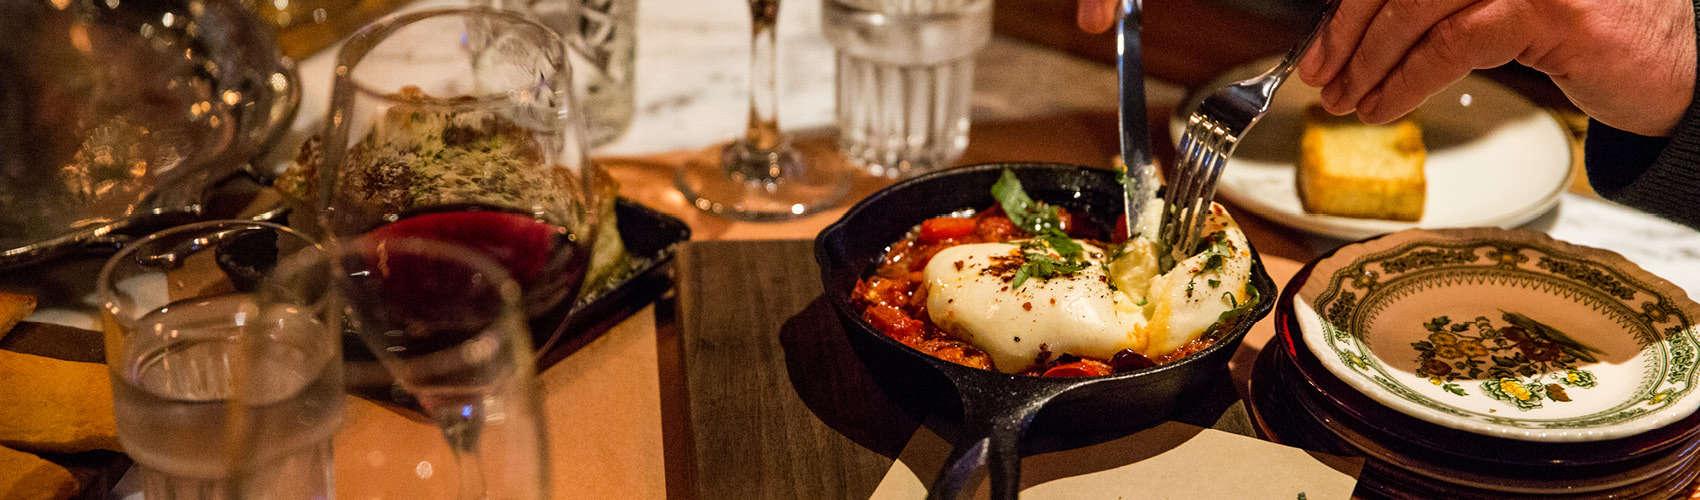 Scaddabush italian kitchen bar yonge gerrard for The perfect kitchen mississauga menu